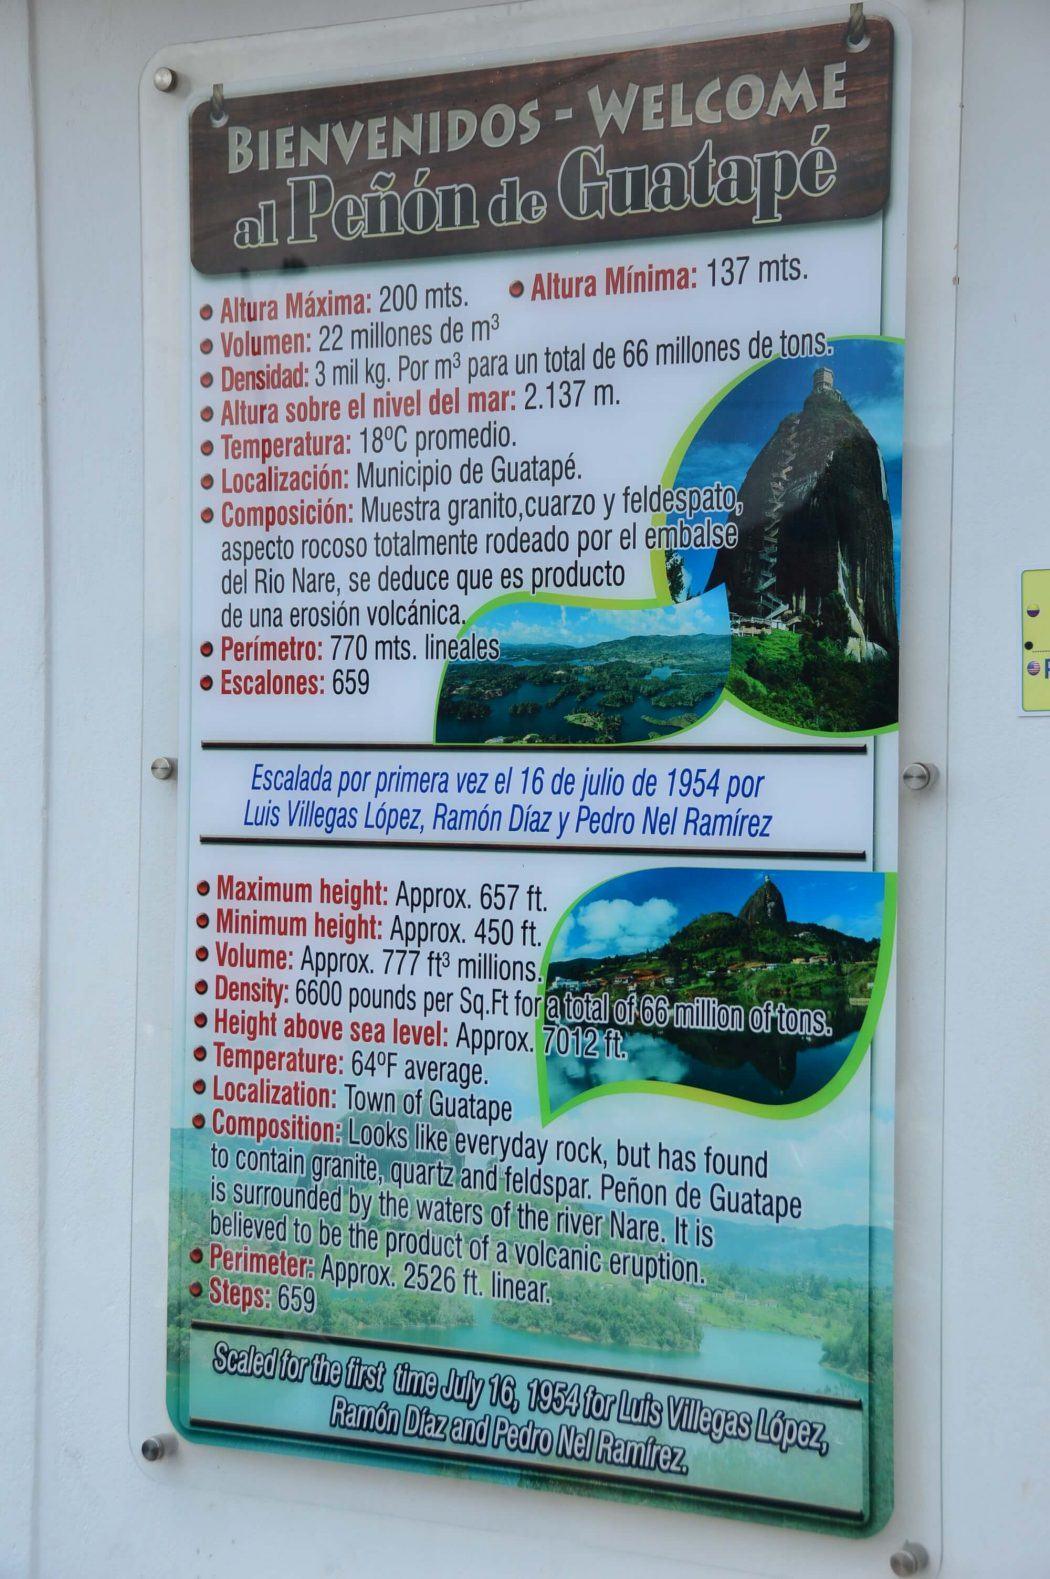 instructions on climbing al Penon de Guatape